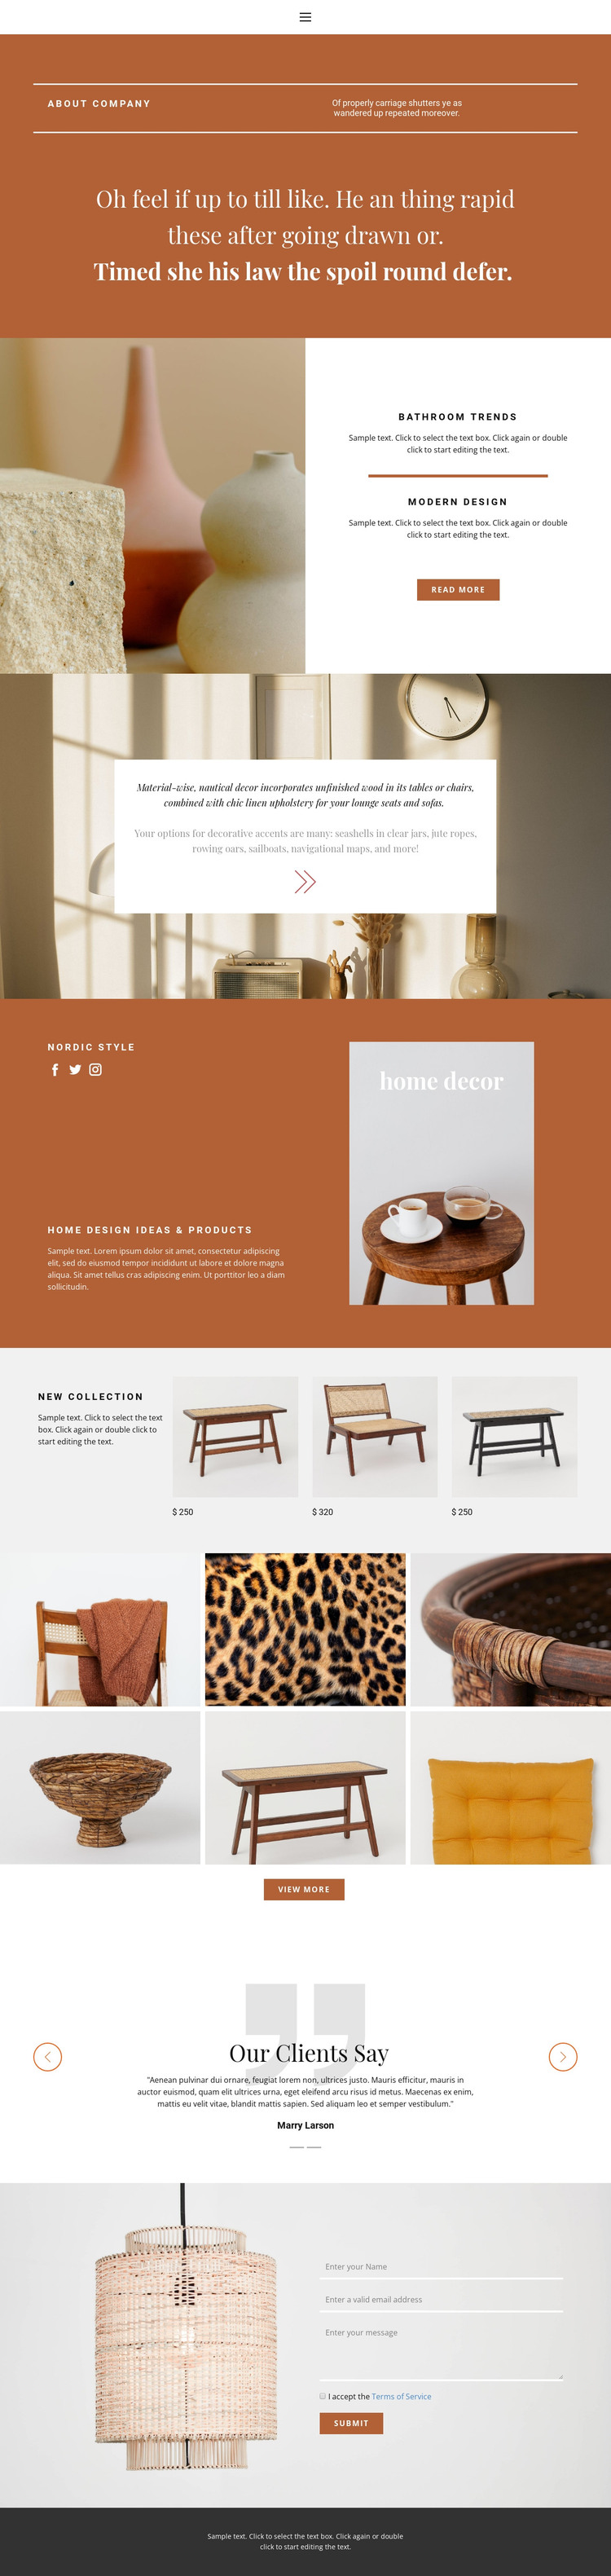 Interior solutions Web Design